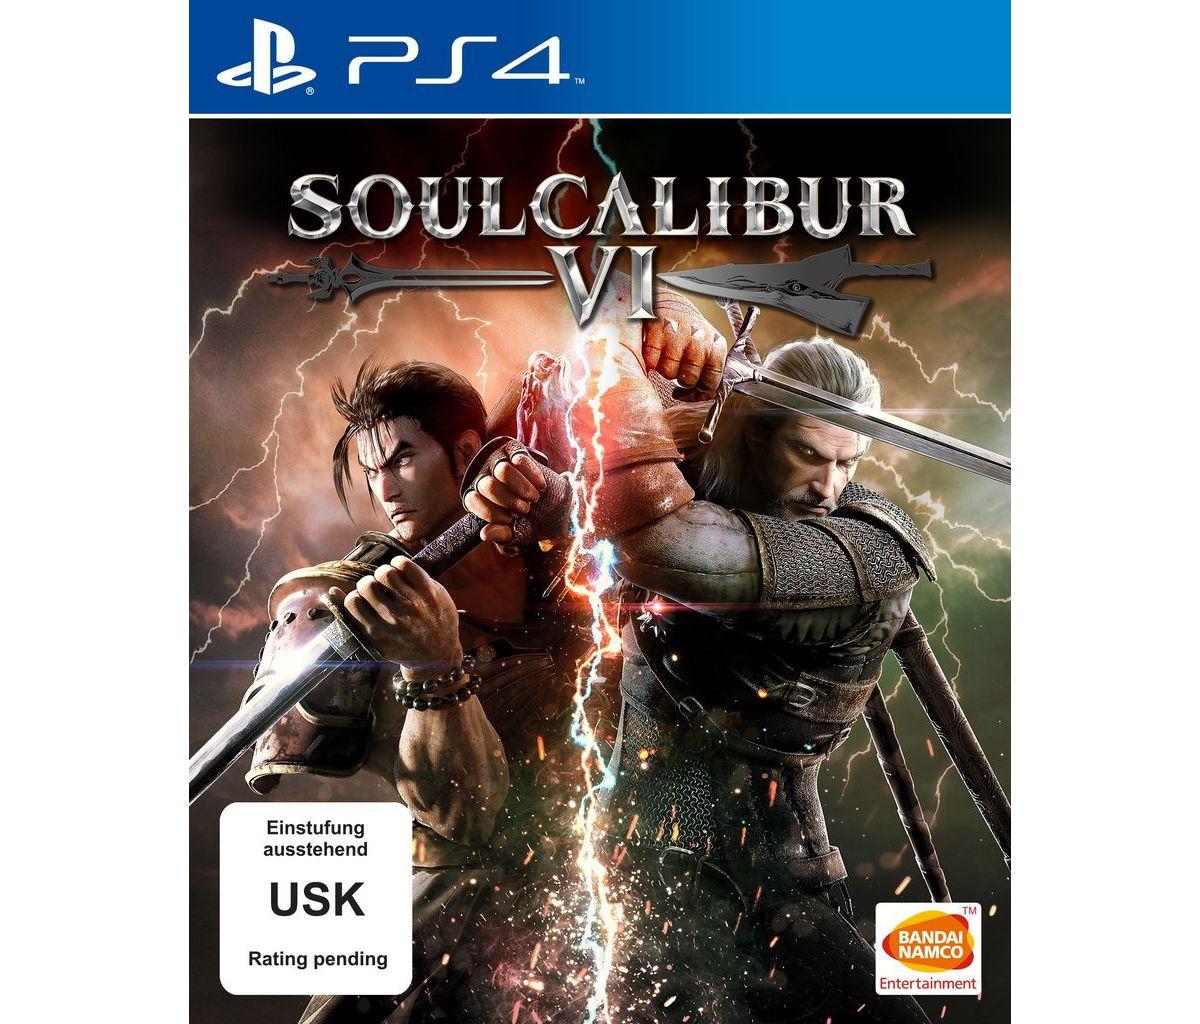 Bandai Playstation 4 - Spiel »SoulCalibur VI«